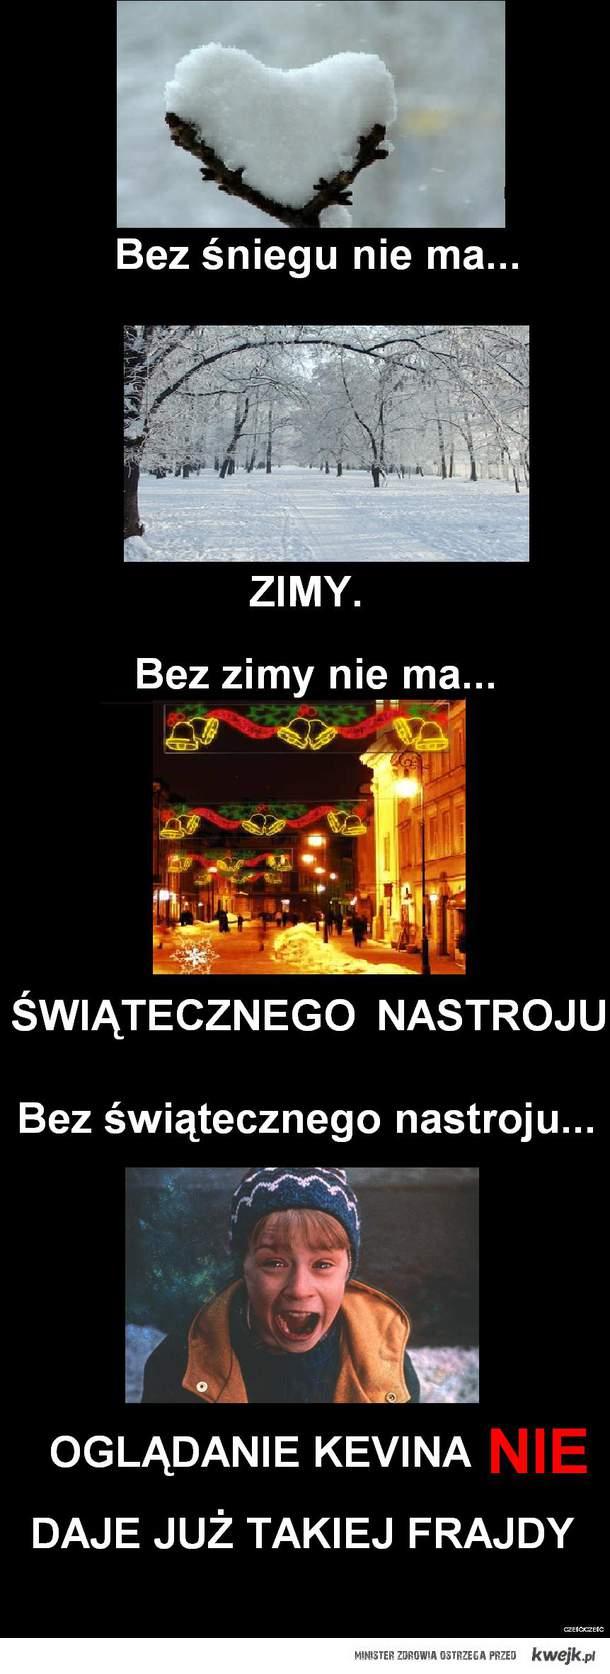 CHCEMY ŚNIEG!